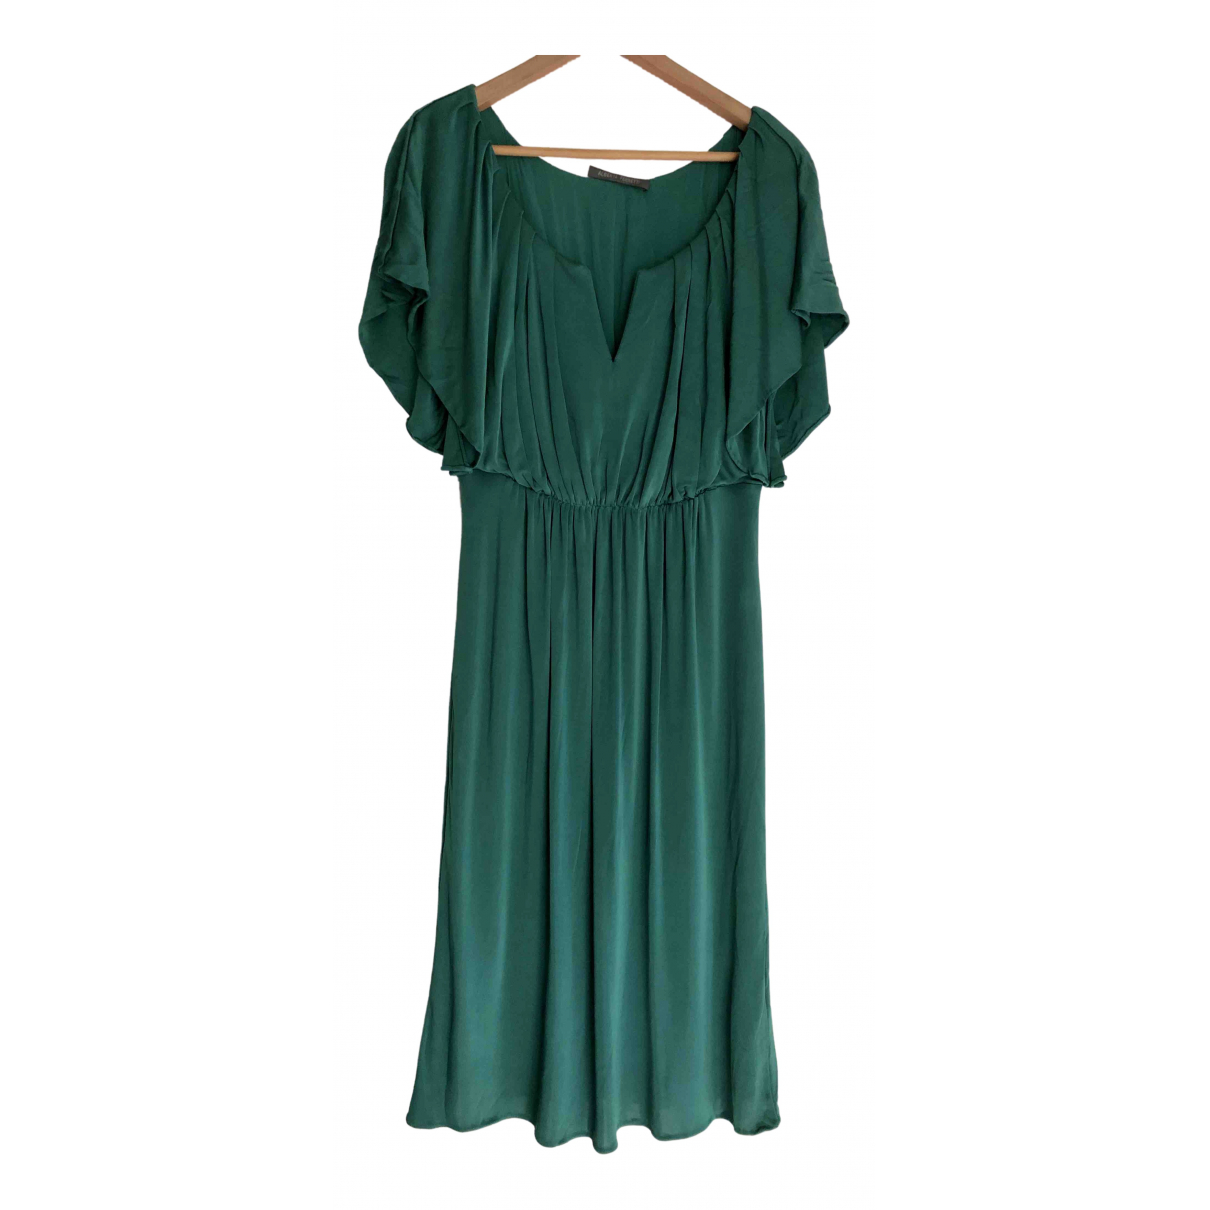 Alberta Ferretti \N Kleid in  Gruen Viskose